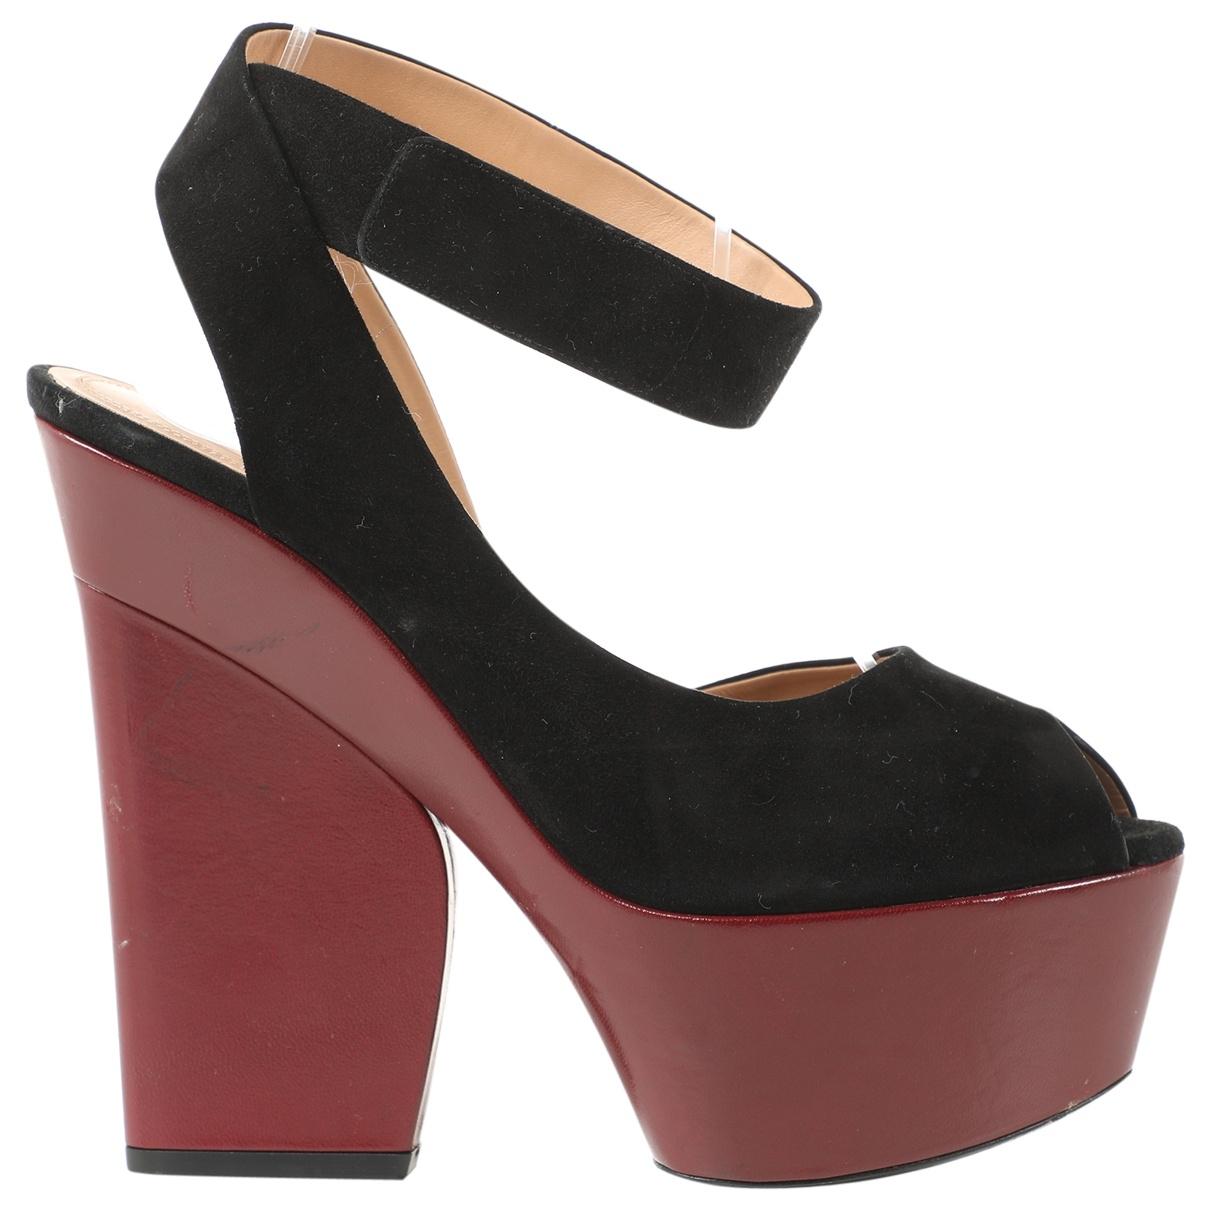 Celine N Burgundy Leather Sandals for Women 37.5 EU